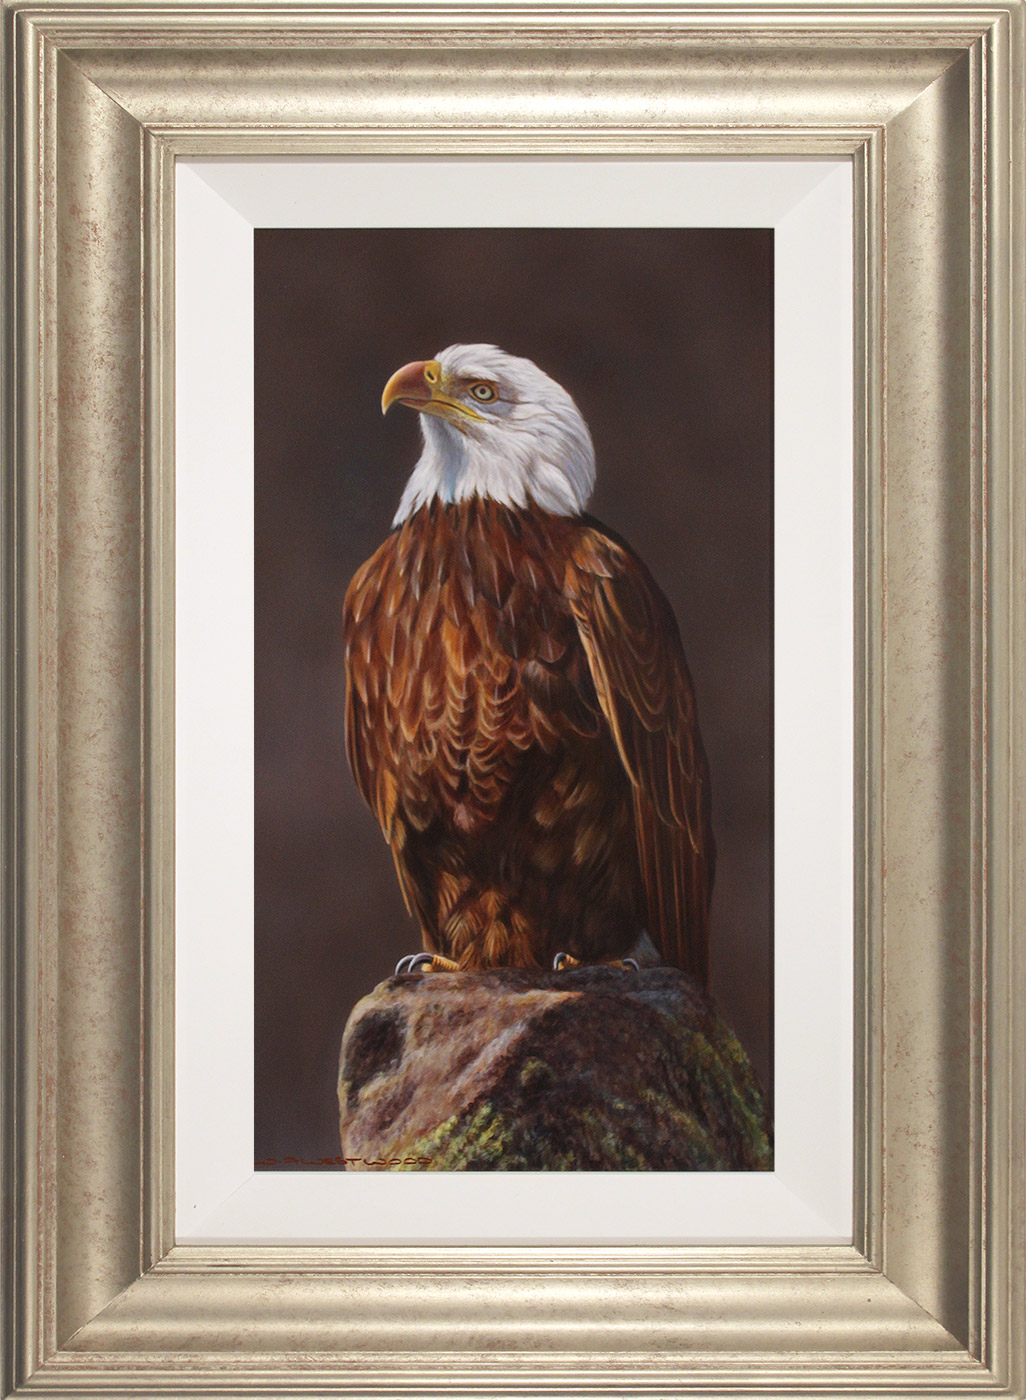 Wayne Westwood, Original oil painting on panel, American Bald Eagle , click to enlarge